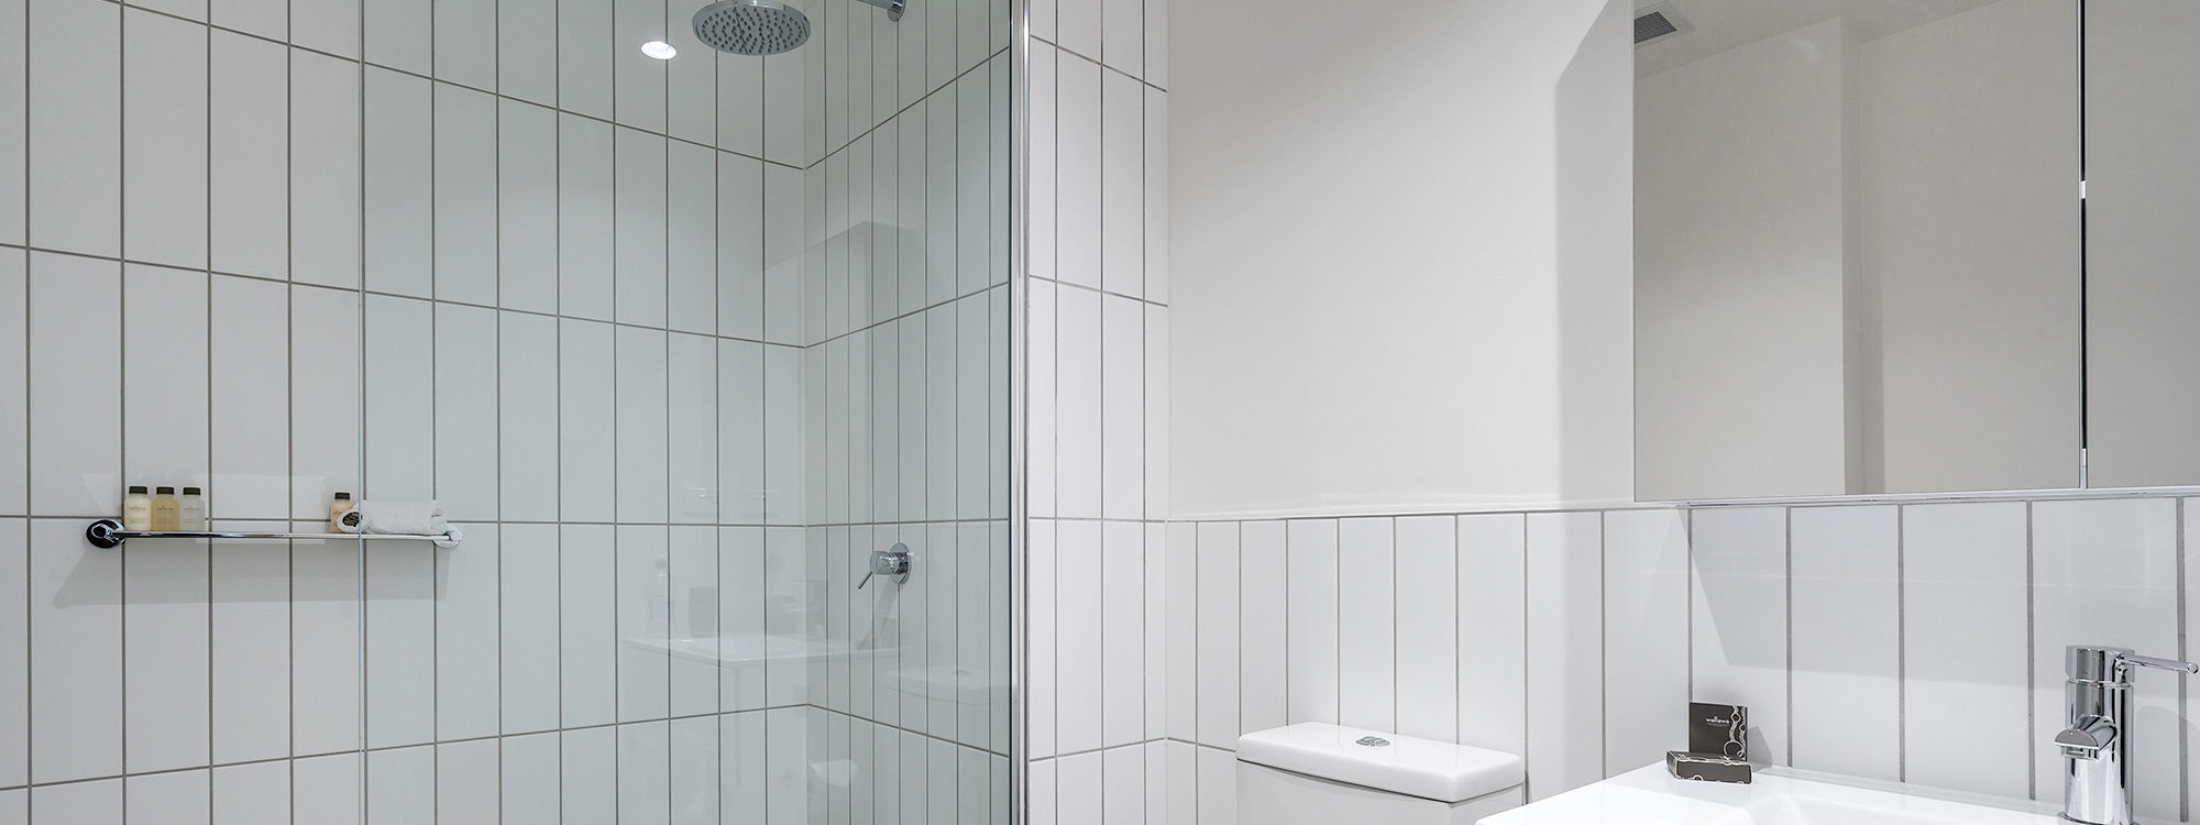 Axel Apartments - The Parkin - Glen Iris - Bathroom